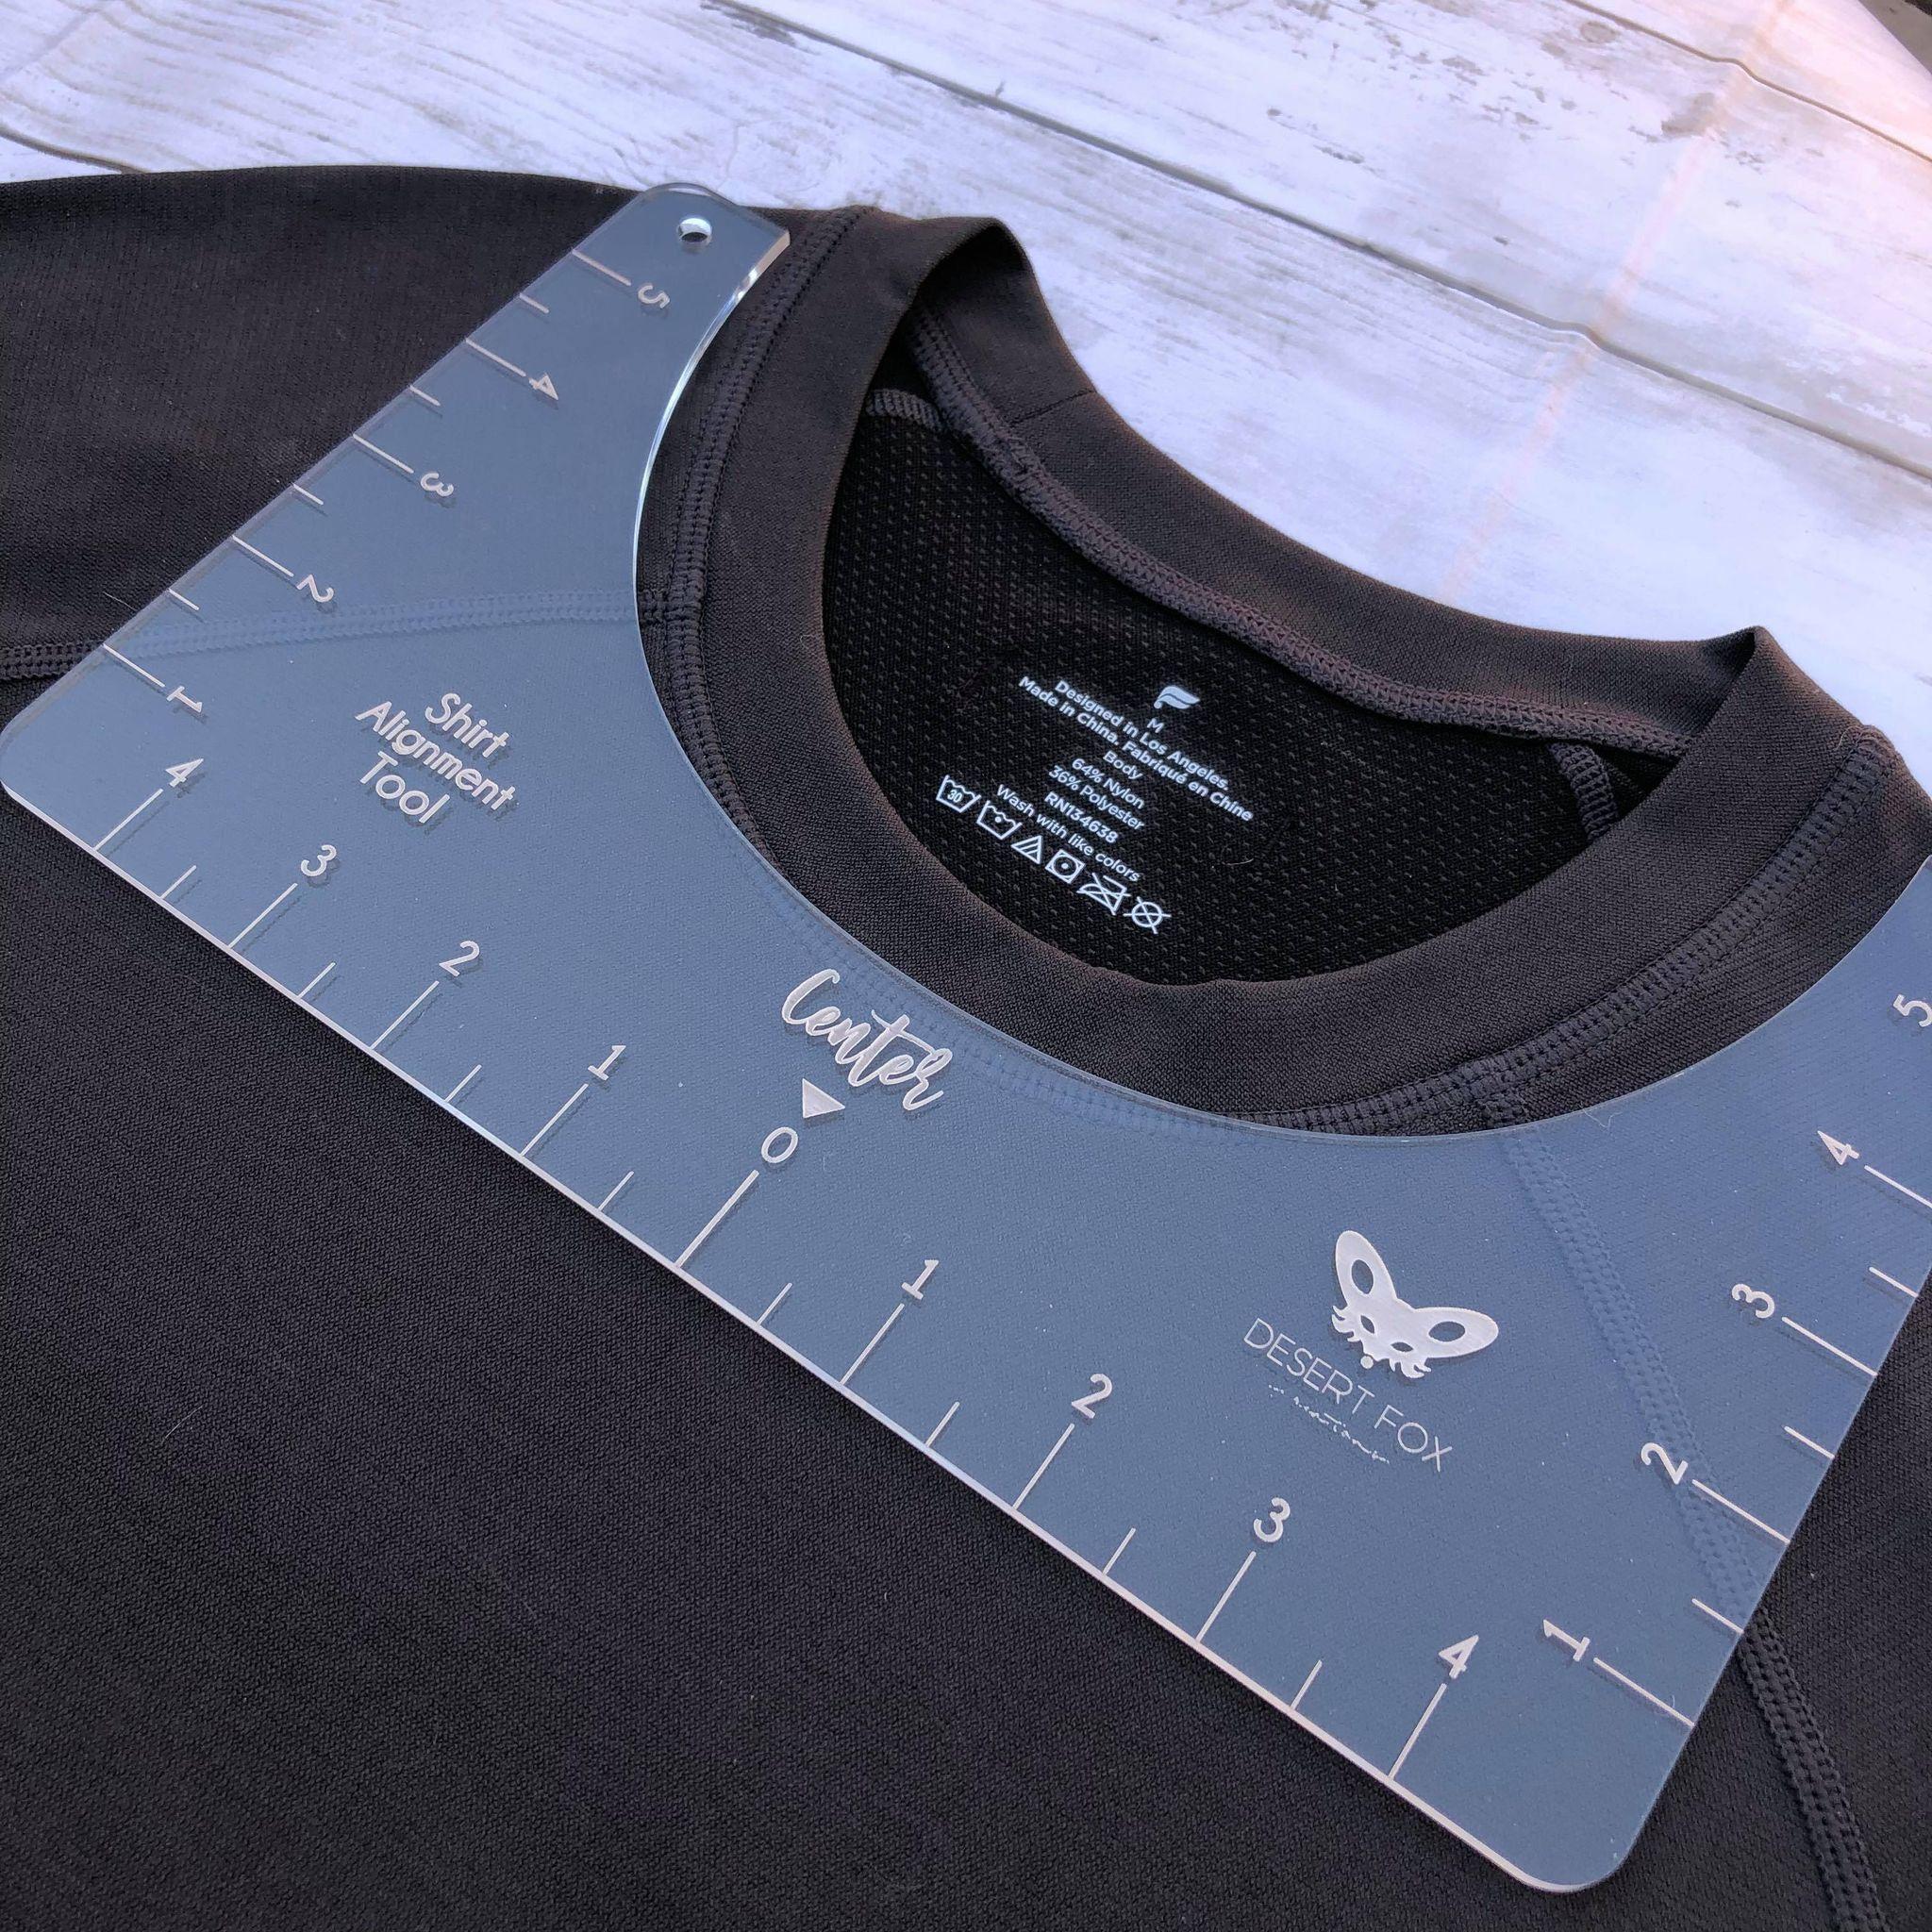 Download T Shirt Alignment Tool T Shirt Ruler One Size Fits All T Shirt Centering Screen Alignment Vinyl Alignment Sublimation Cricut Vinyl Shirts Shirts Vinyl